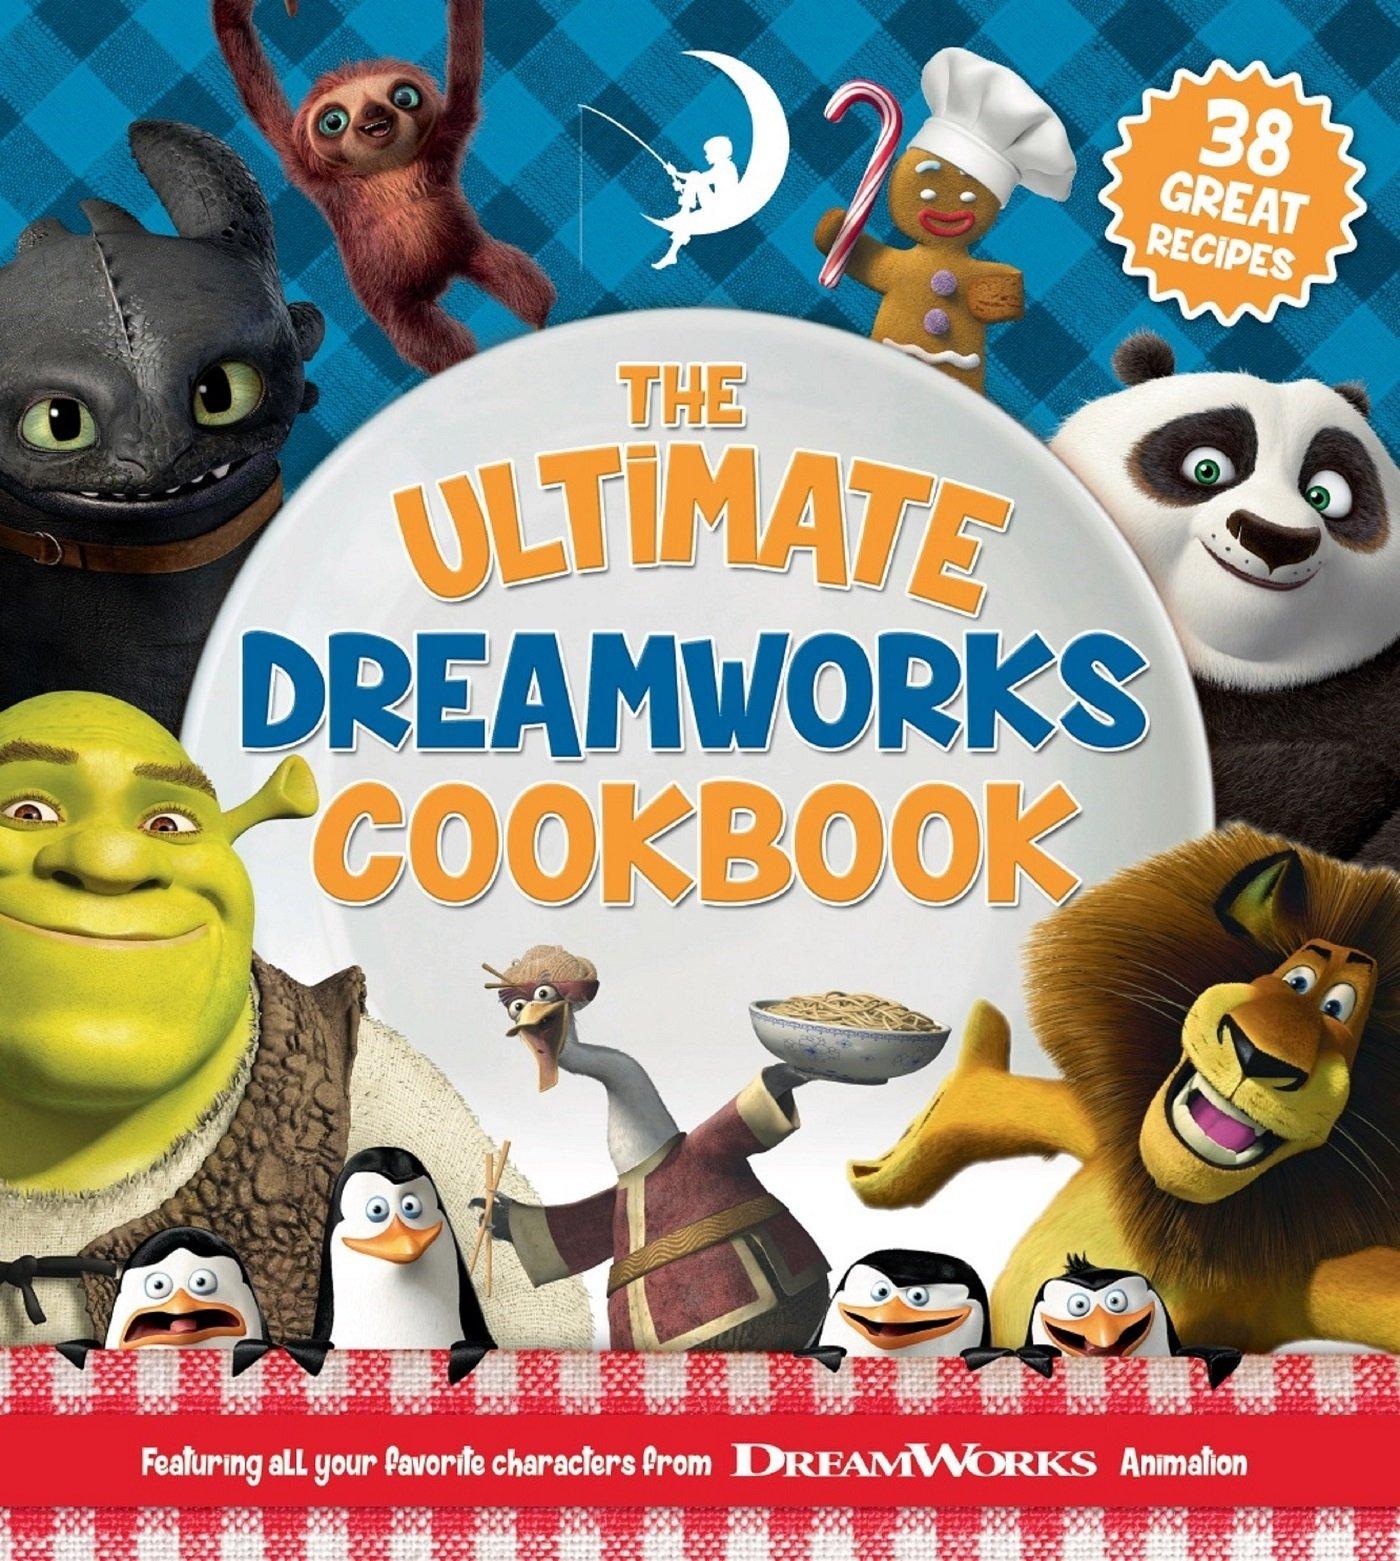 The Ultiimate Dreamworks Cookbook